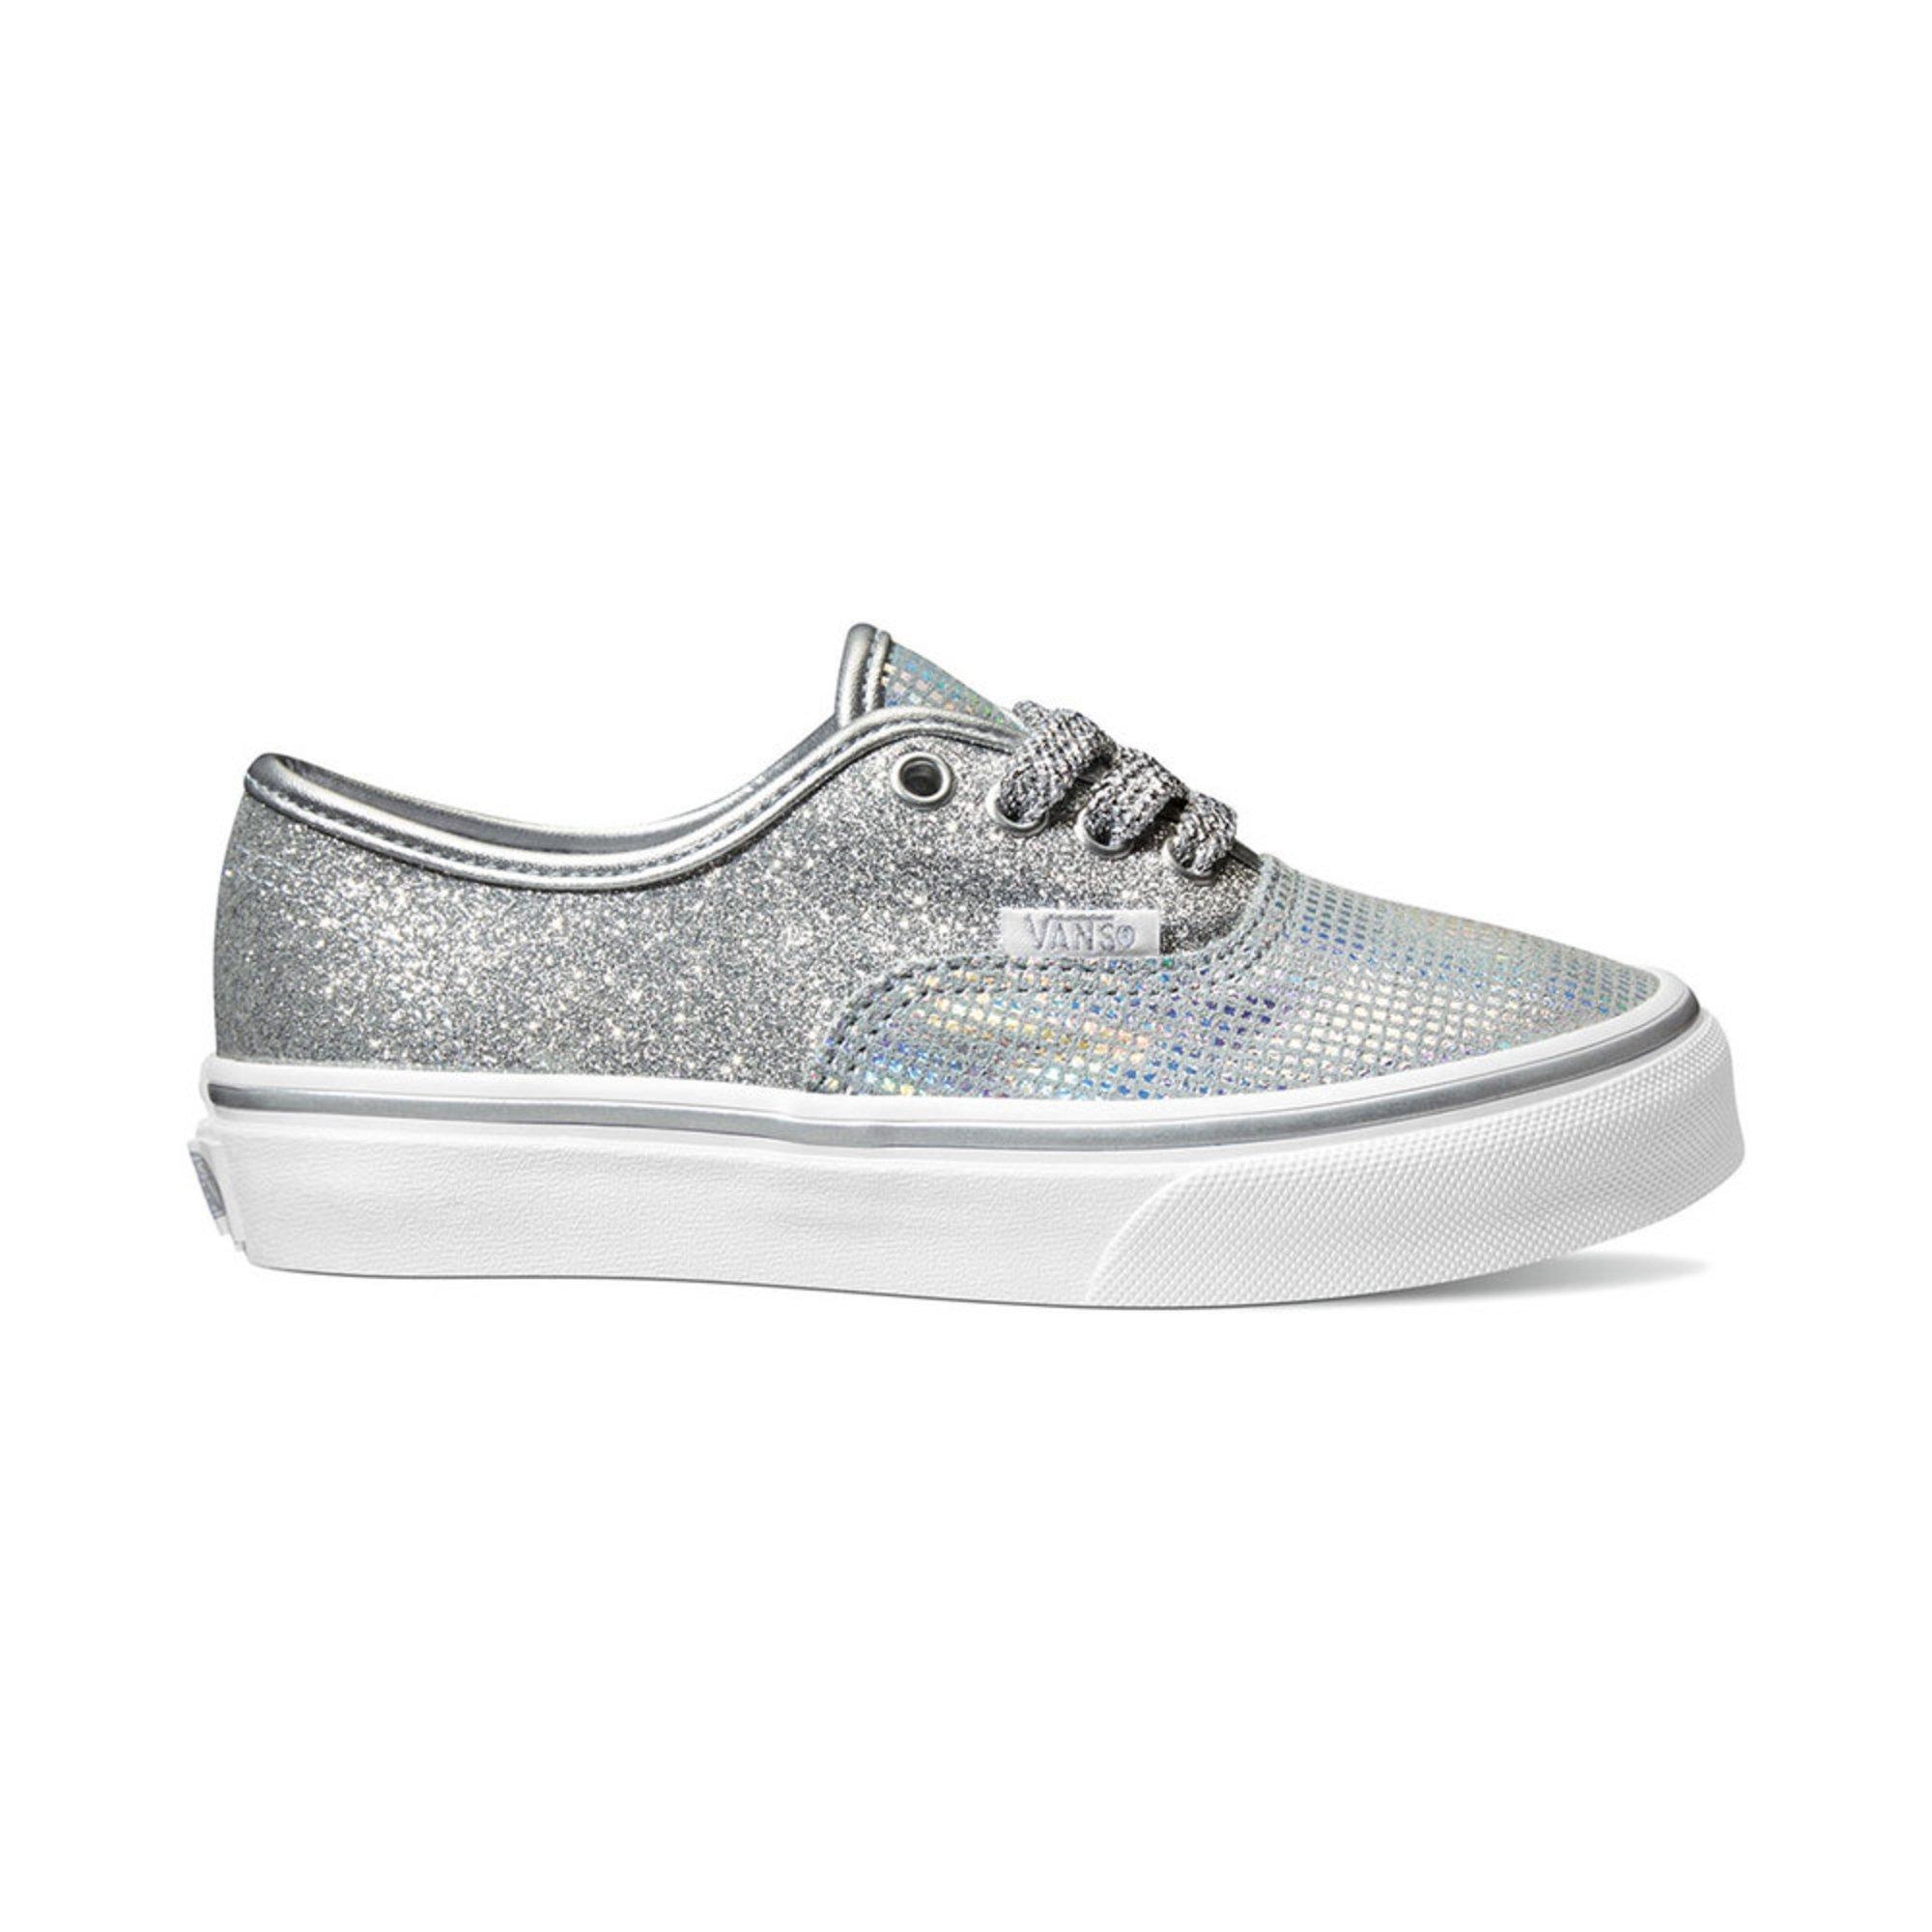 214e2f6af2 Vans Girls Authentic Metallic Glitter Skate Shoe (youth)